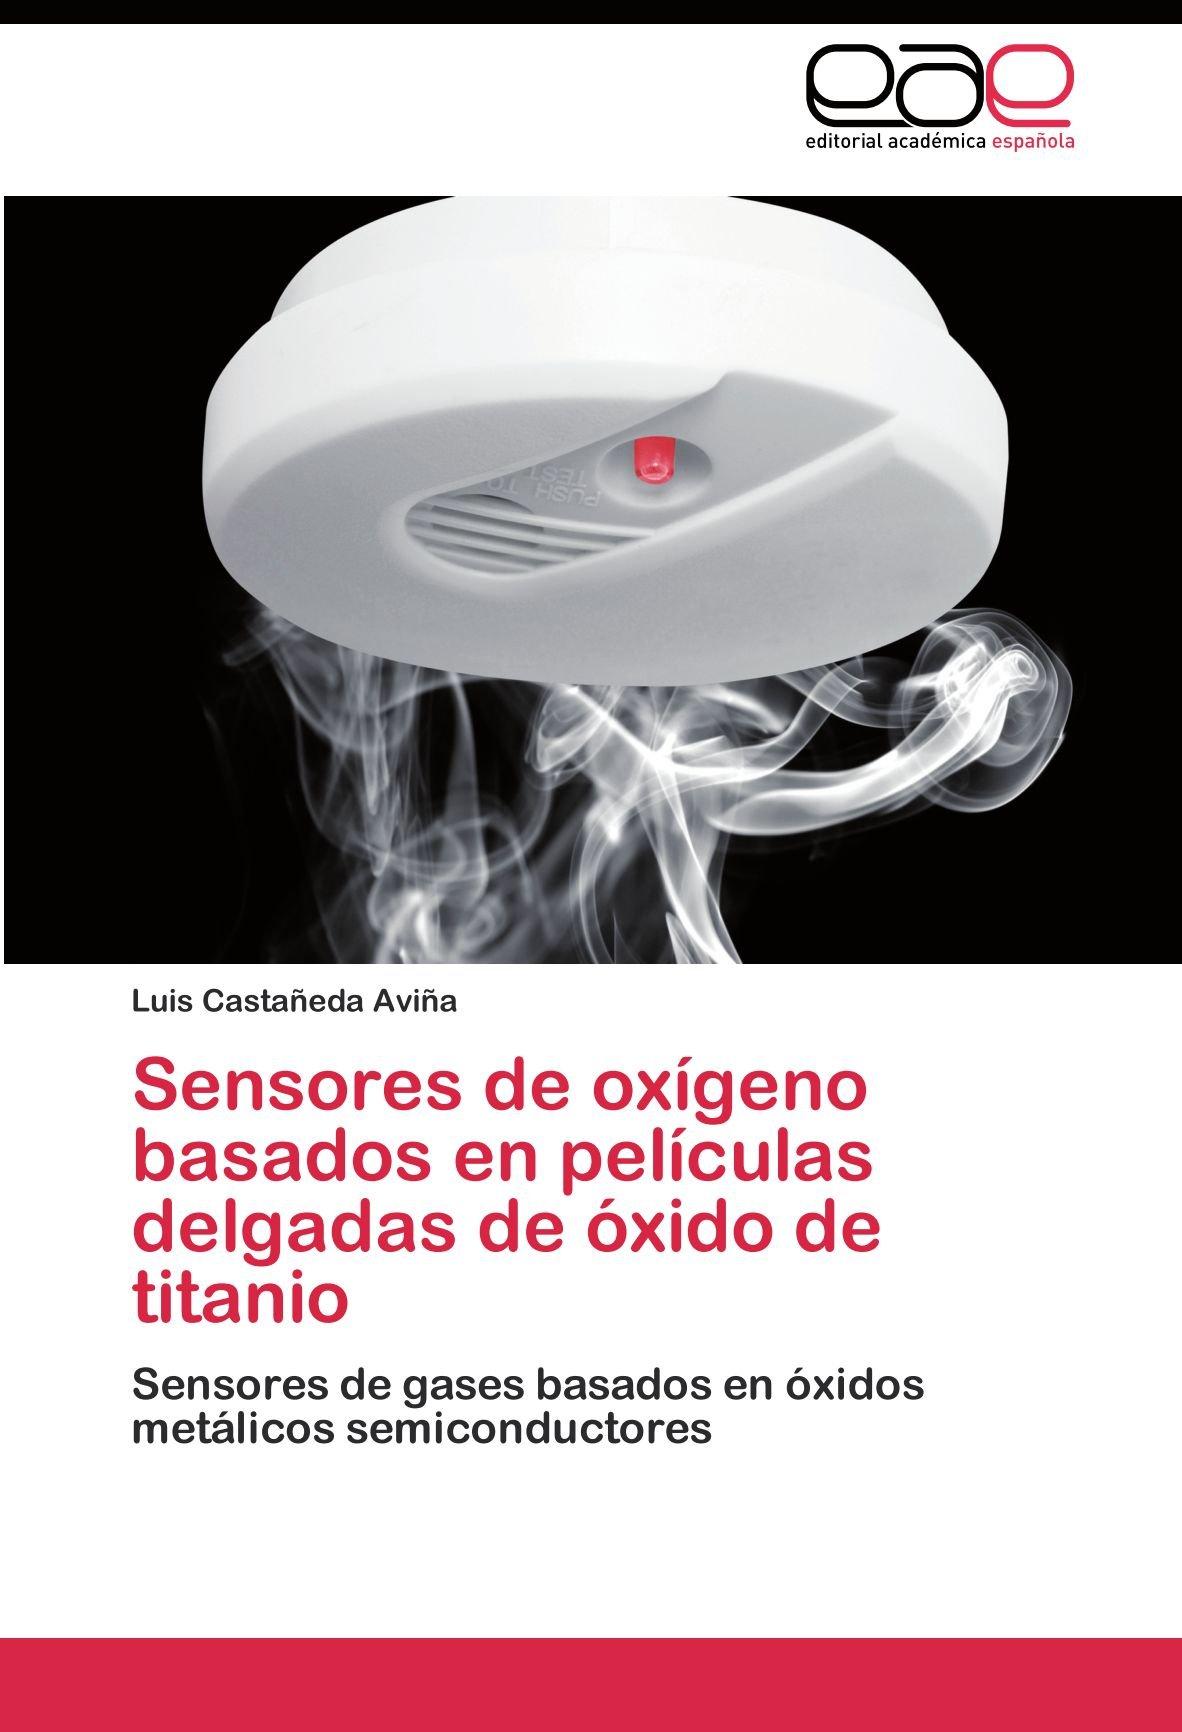 Sensores de oxígeno basados en películas delgadas de óxido de titanio: Amazon.es: Castañeda Aviña Luis: Libros